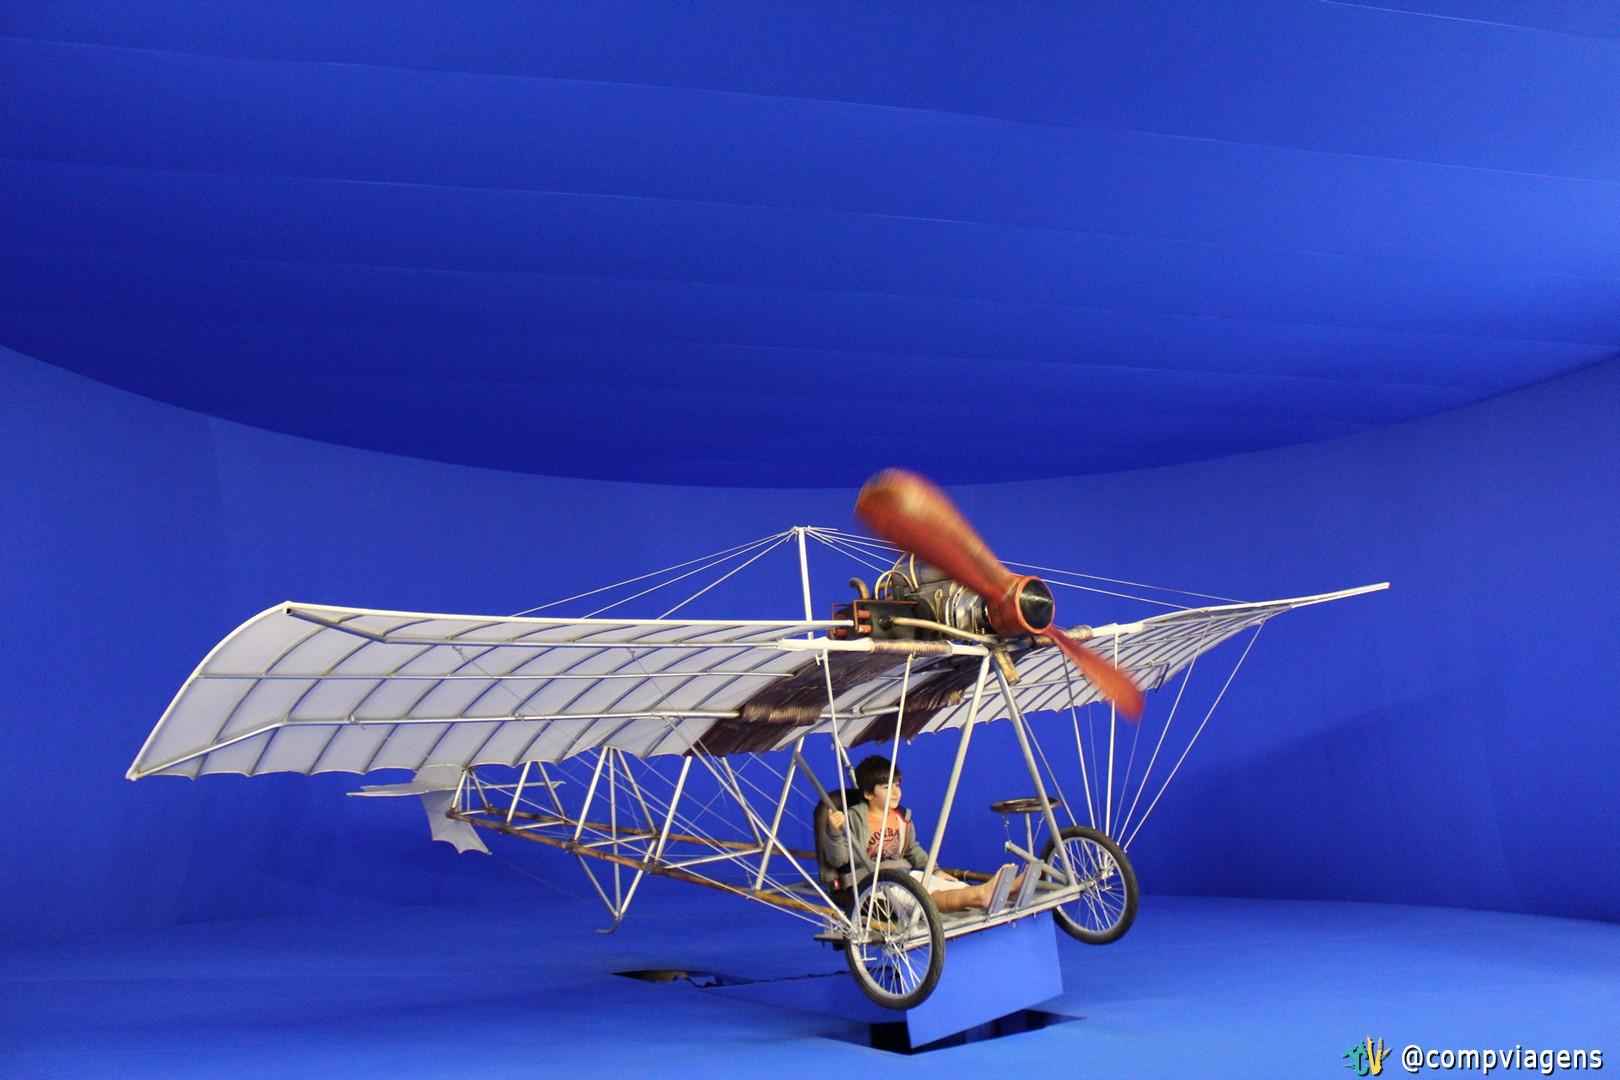 Demoiselle, onde é possível fazer um voo virtual